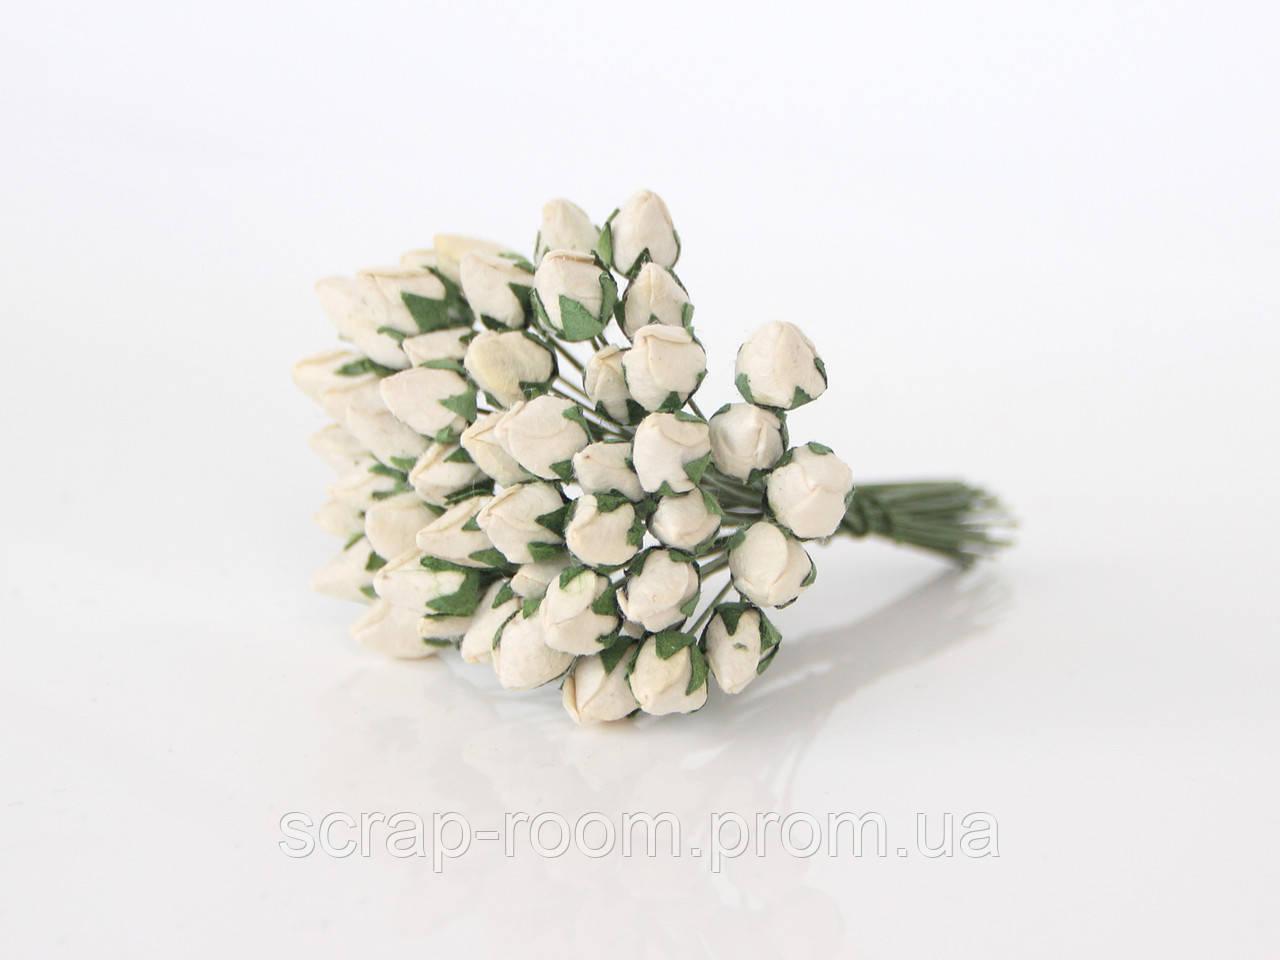 Роза бутон закрытый светлый бежевый 1 см, бутоны розы закрытые беж, бежевые розы, бумажные цветы, цена за 1 шт